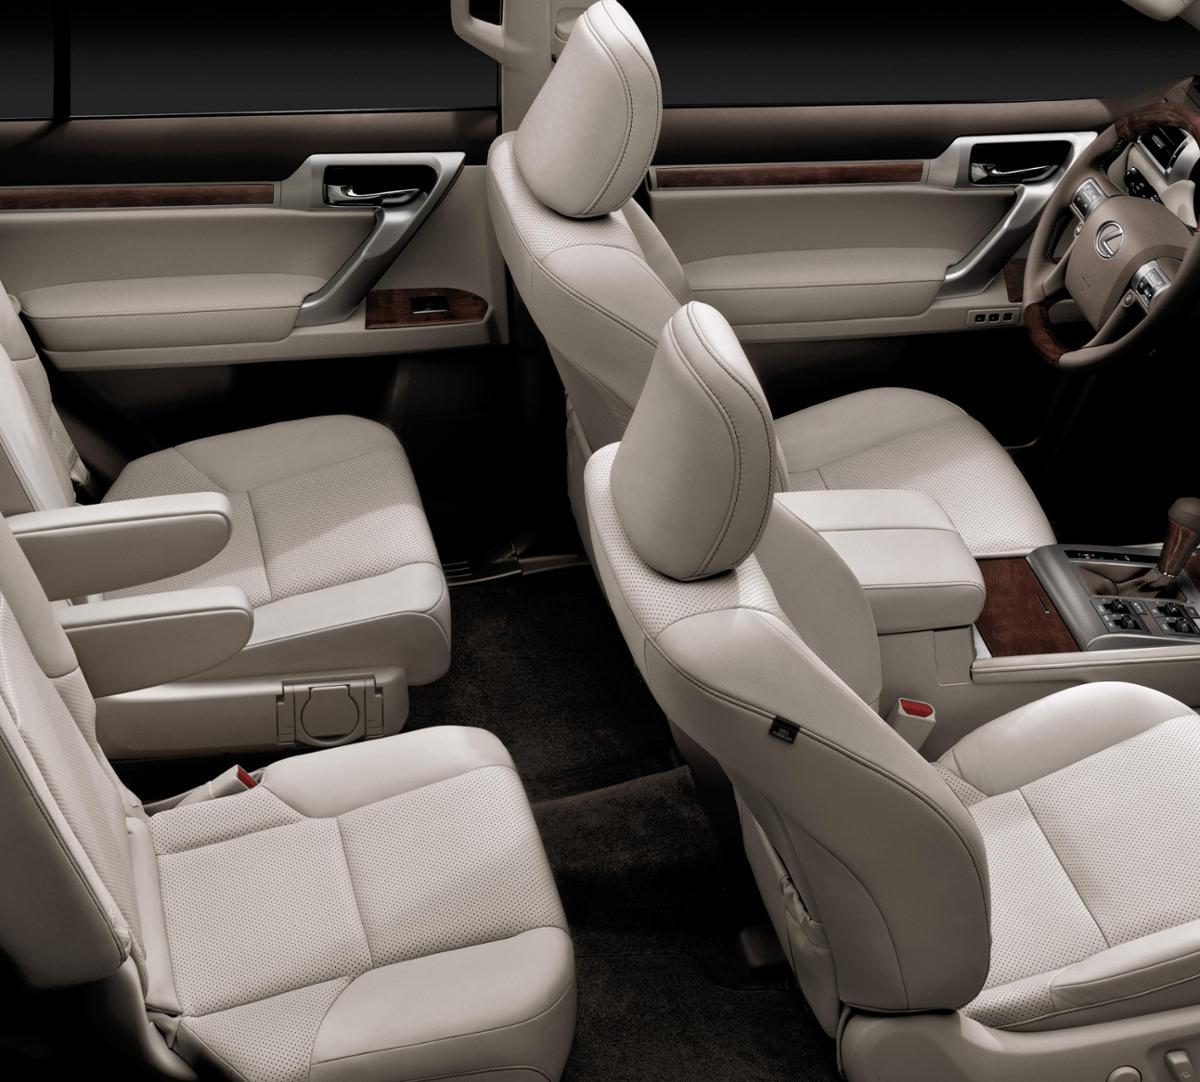 2013 Lexus 460 For Sale: Fort Worth New 2019 Lexus GX 460 Silver Lining Metallic